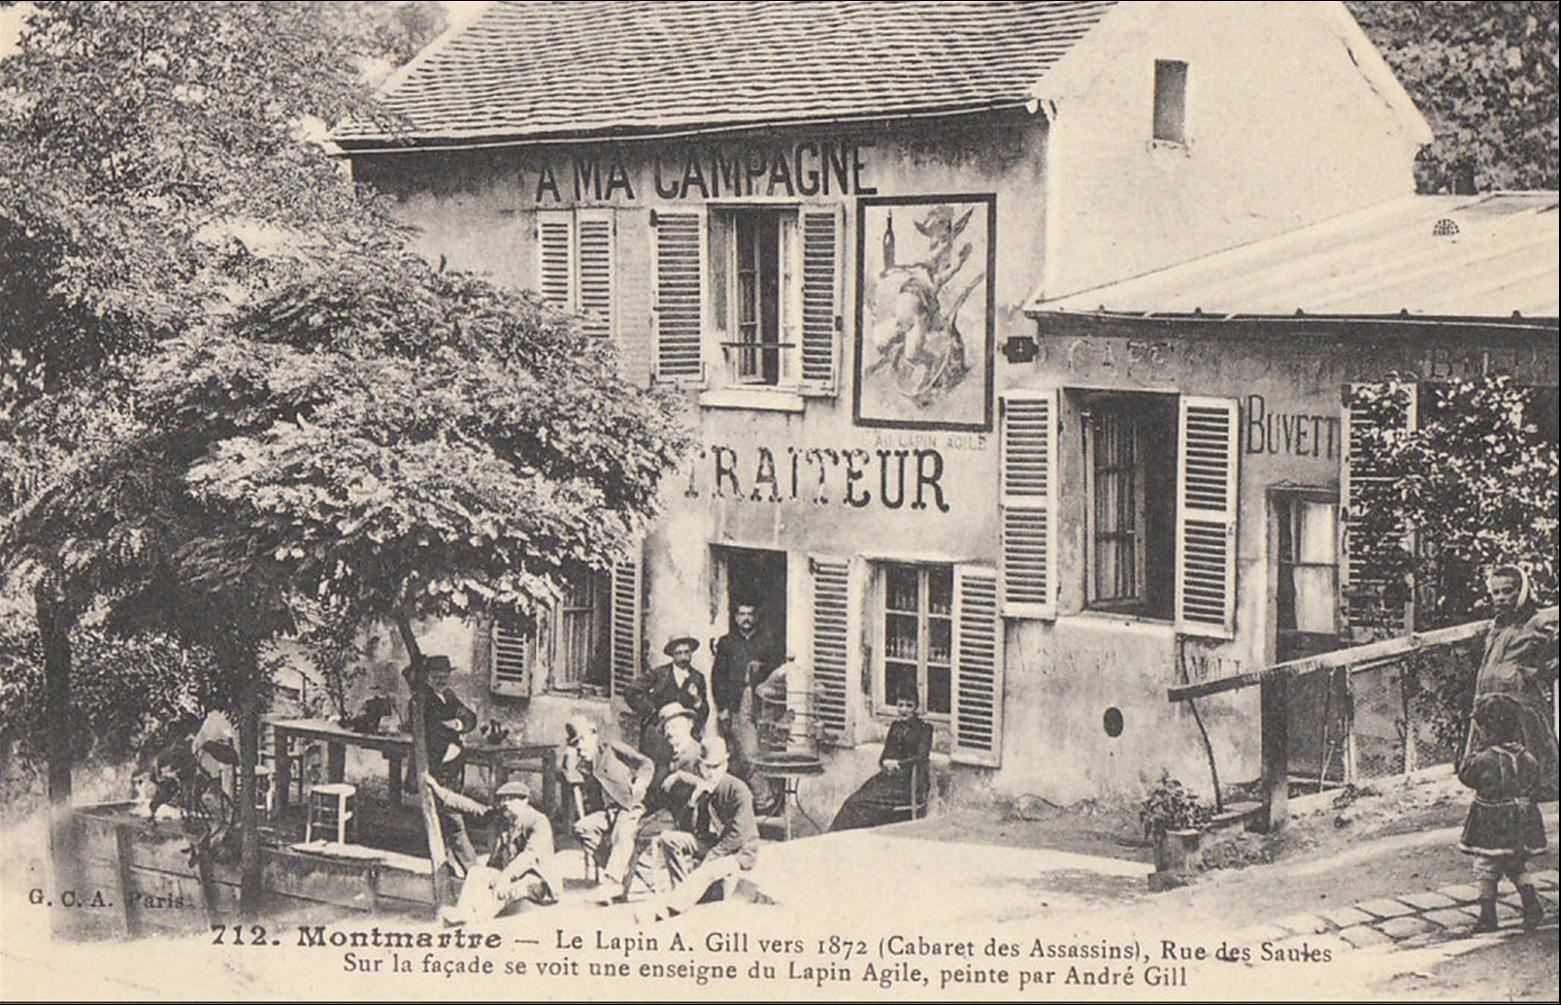 O Manger Montmartre Histoires2muses